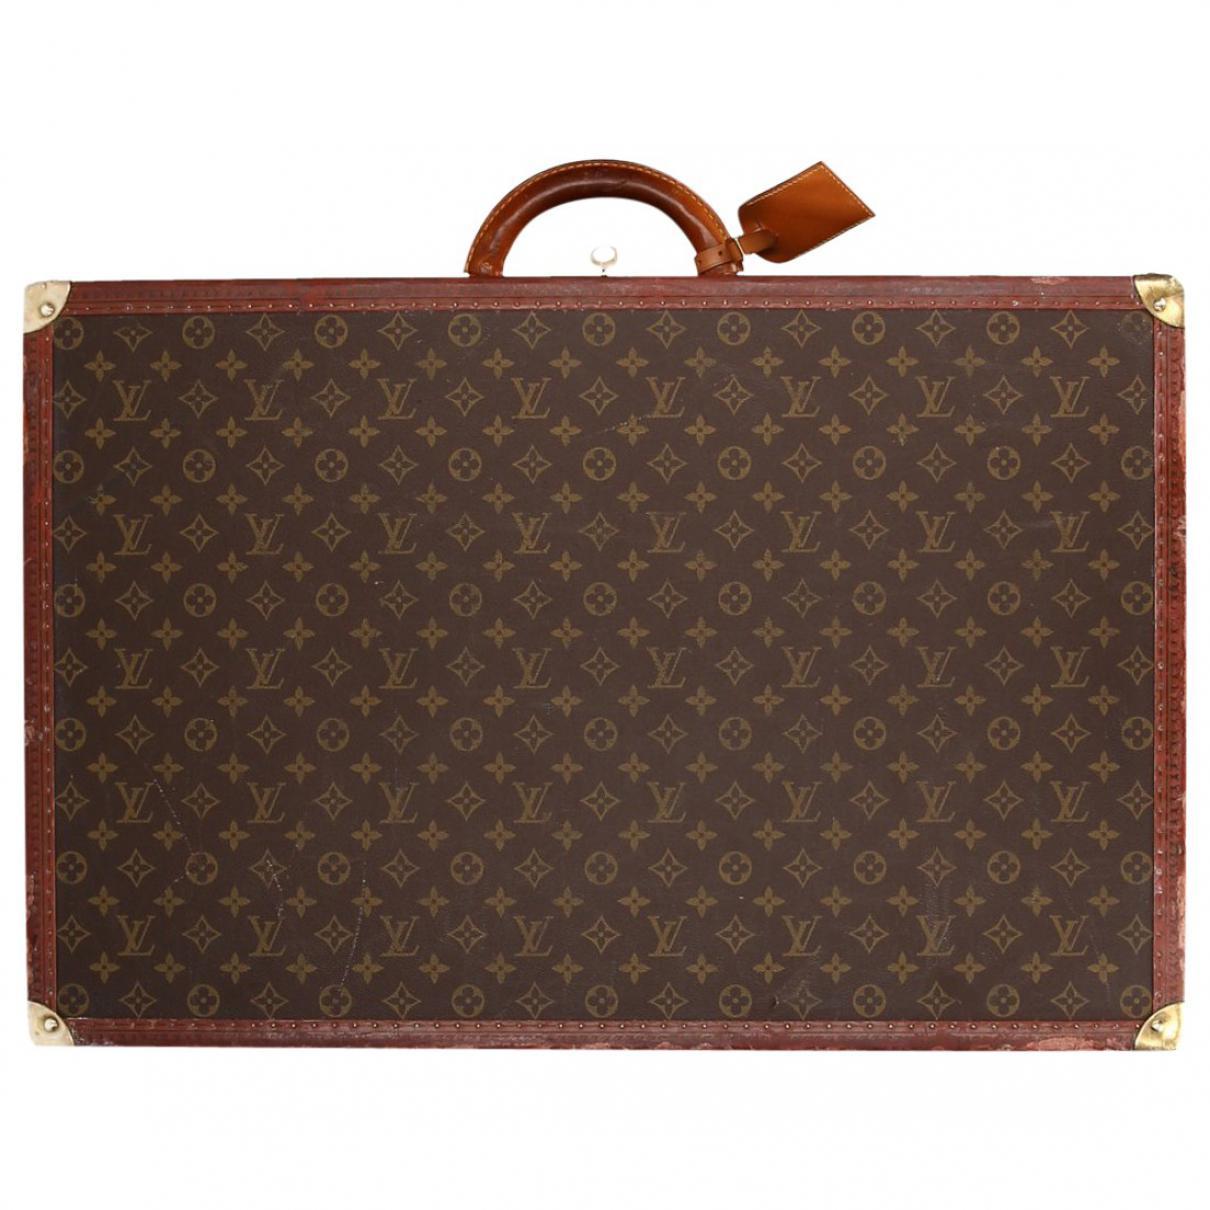 644bac663890 Lyst - Louis Vuitton Vintage Brown Cloth Travel Bag in Brown